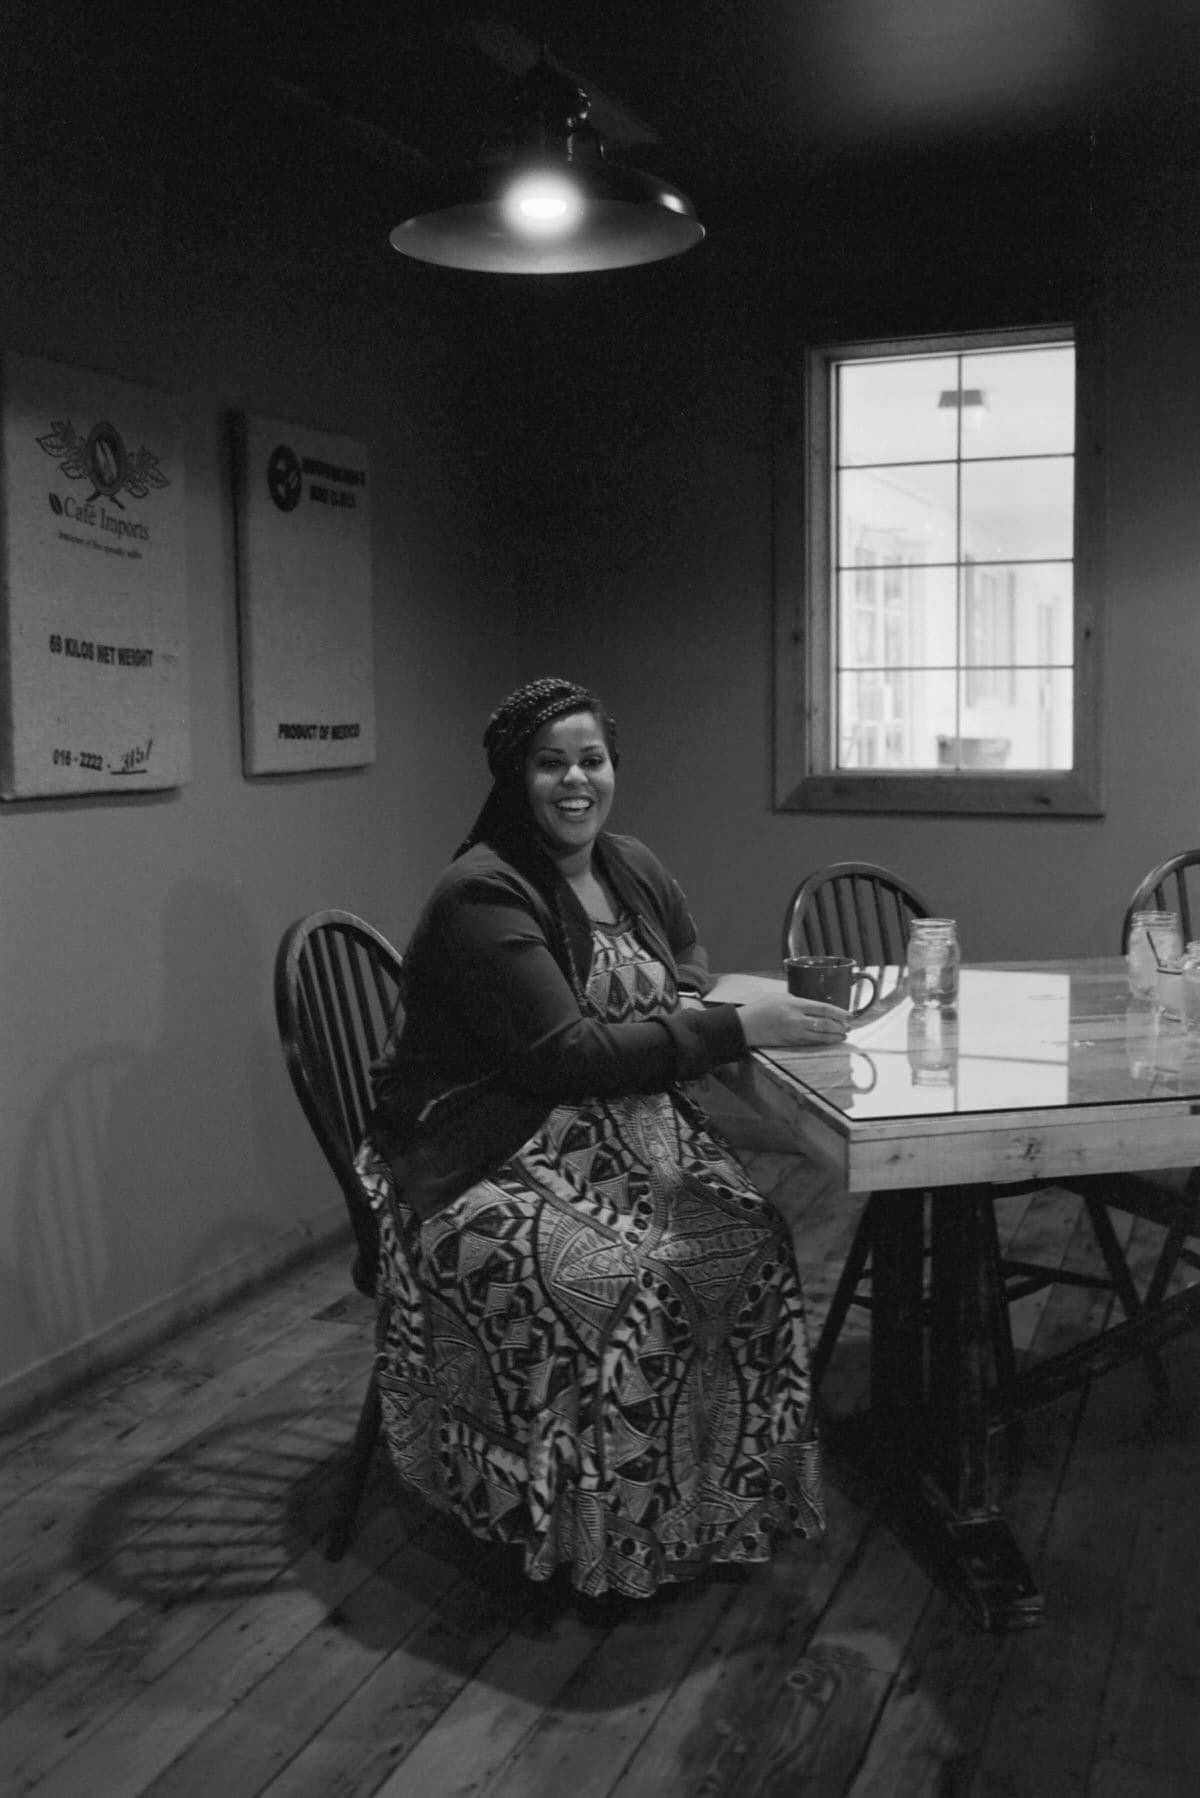 Illuminating-Women-art-exhibition-black-and-white-fine-art-film-photography-by-Studio-L-photographer-Laura-Schneider-036